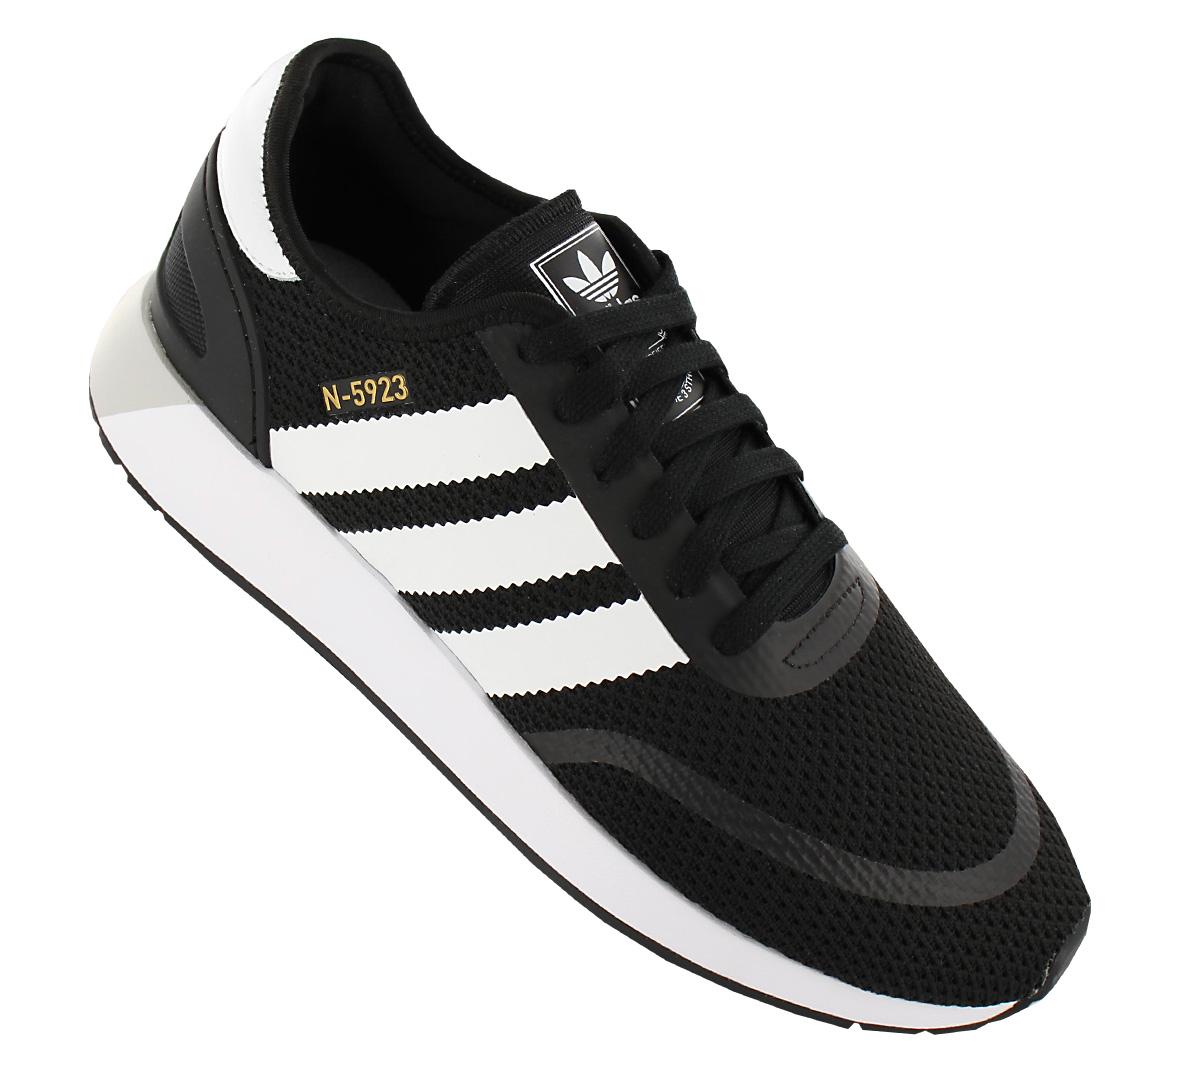 adidas N 5923 CQ2337 CblackFtwwhtGreone Schuhe Outlet